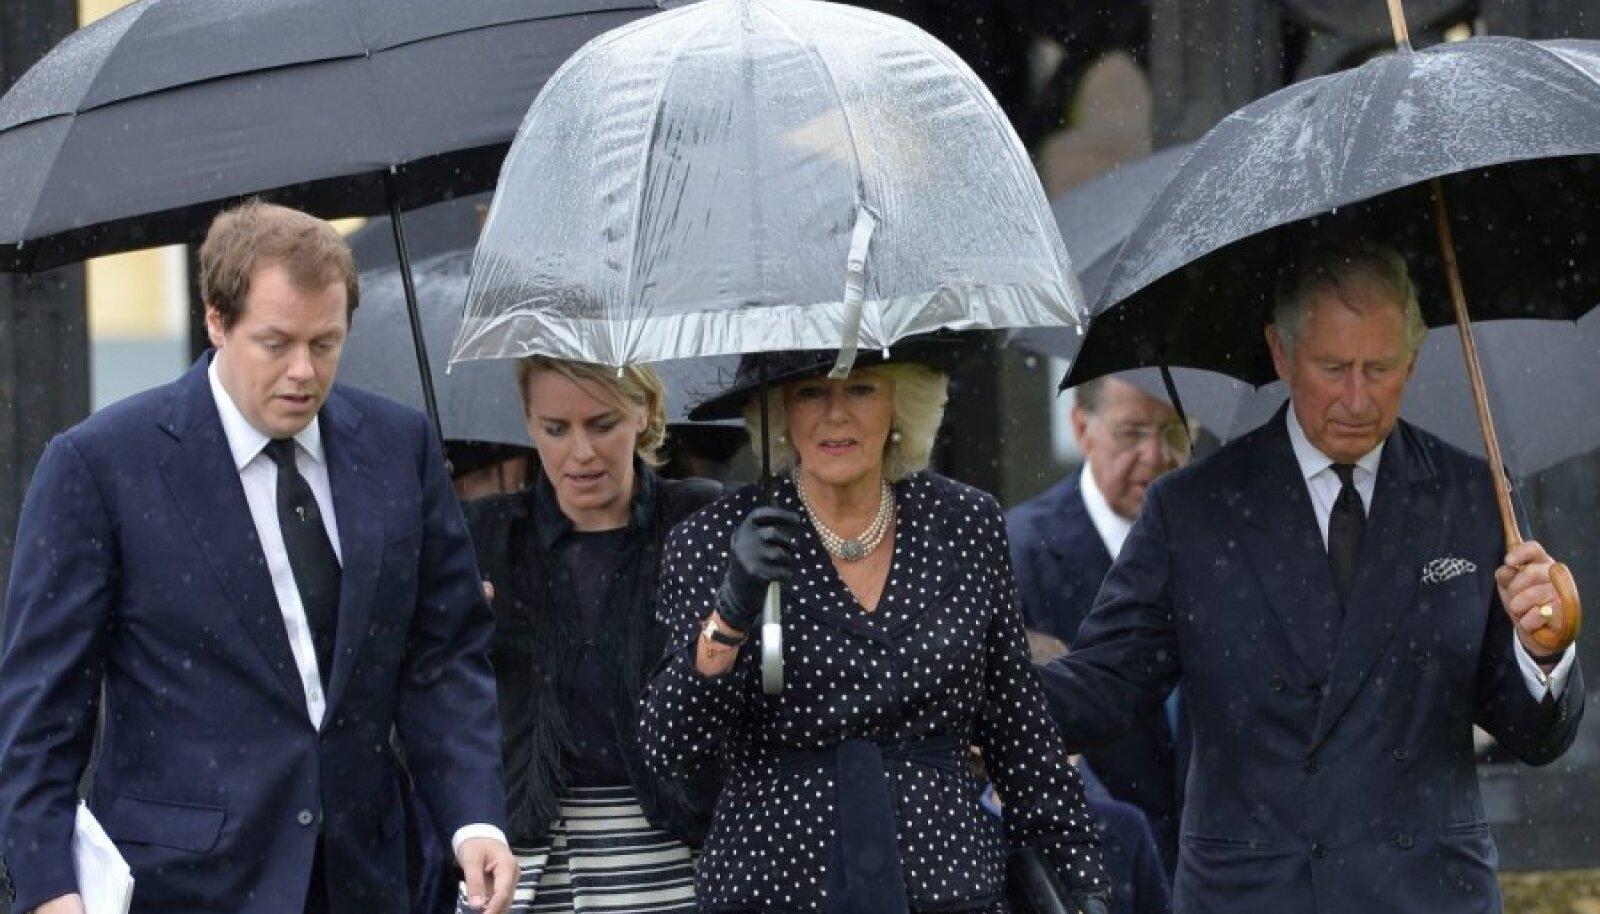 Cornwalli hertsoginna Camilla abikaasa prints Charlesiga Camilla venna Mark Shandi matustel